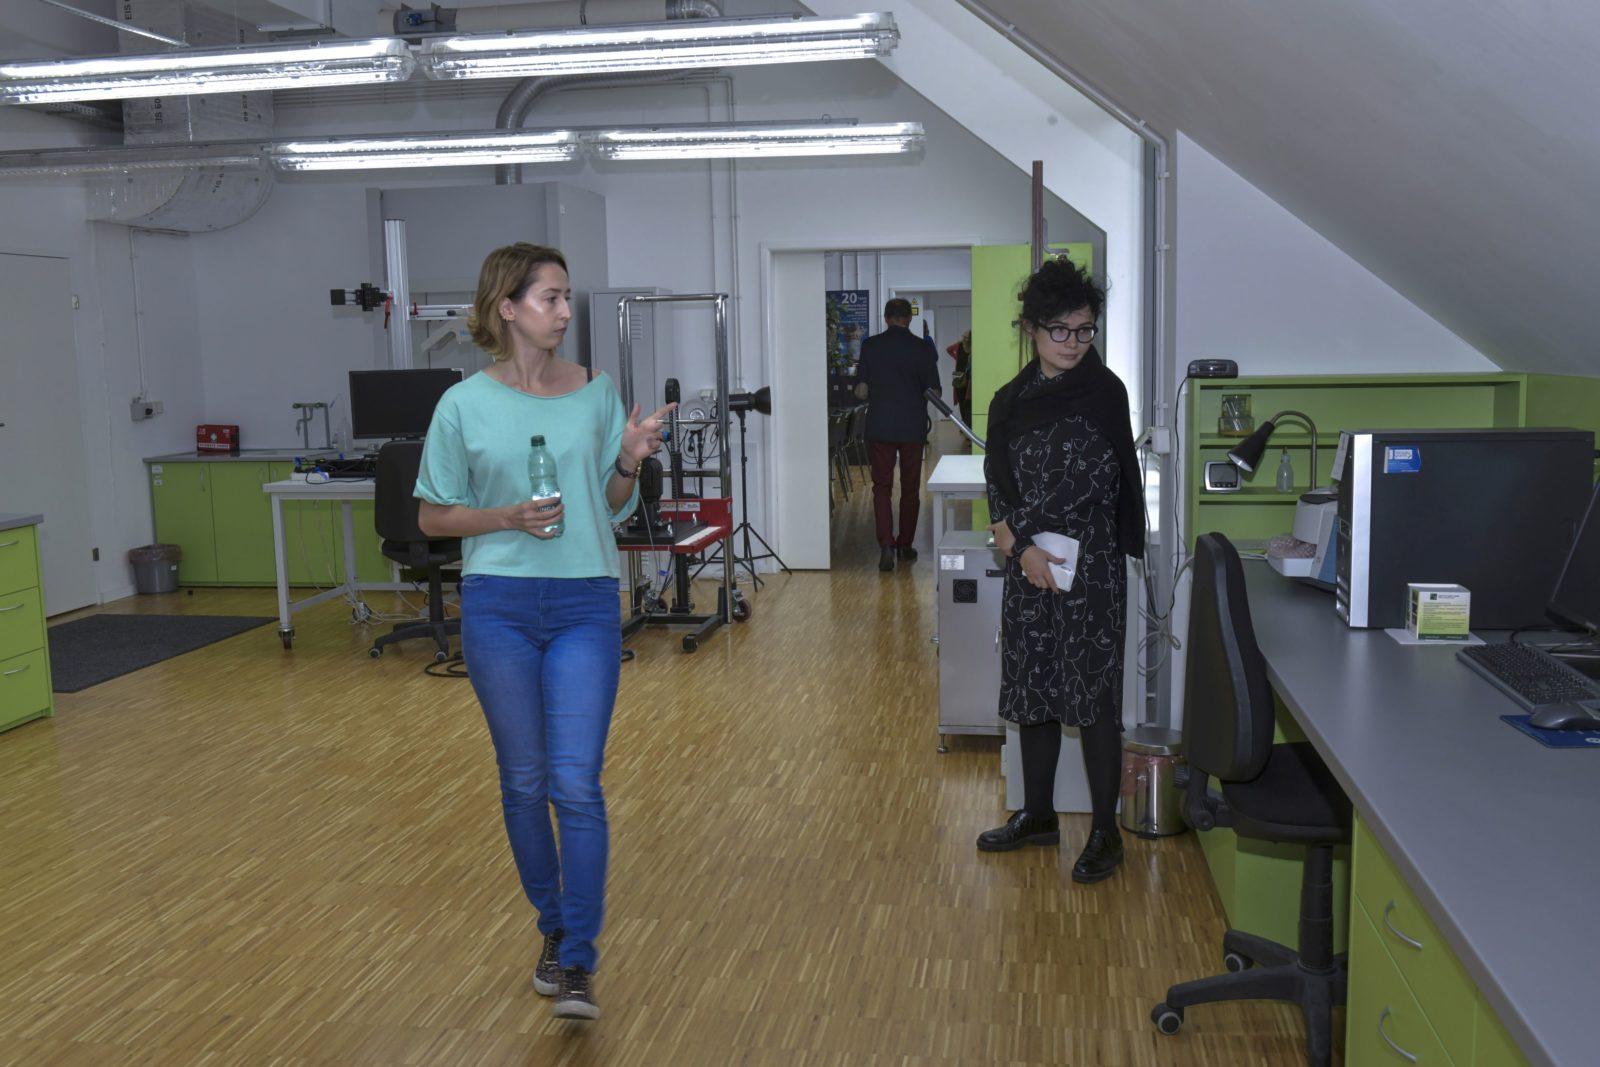 Warschau_2019_tour_Faculty_Stasiuk_Roman_152